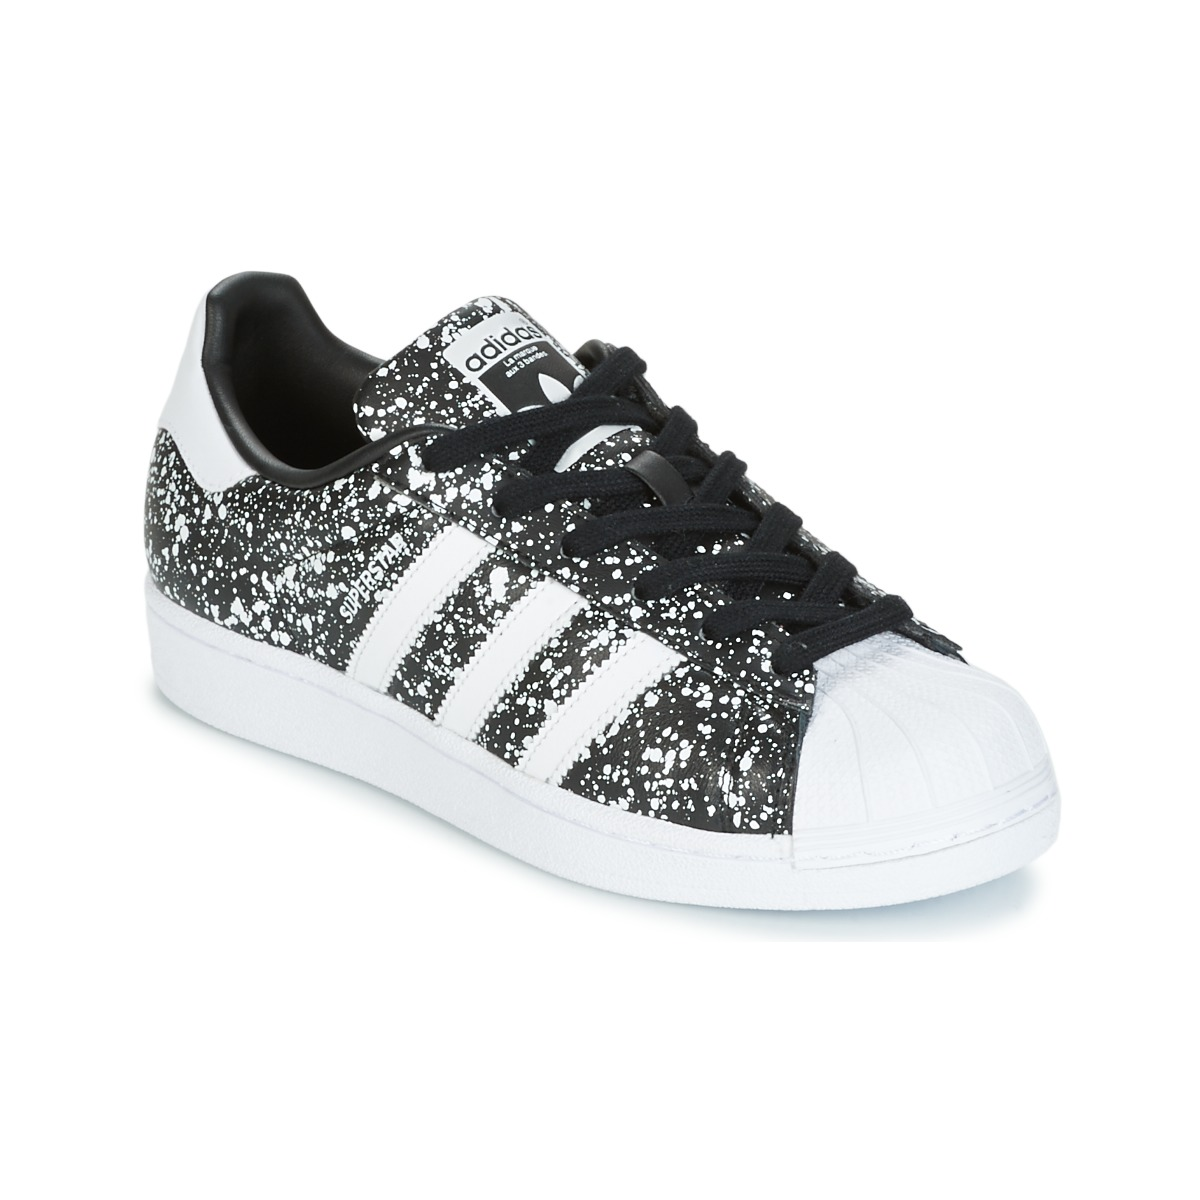 Adidas Originals SUPERSTAR W Noir / Blanc Baskets Basses Femme